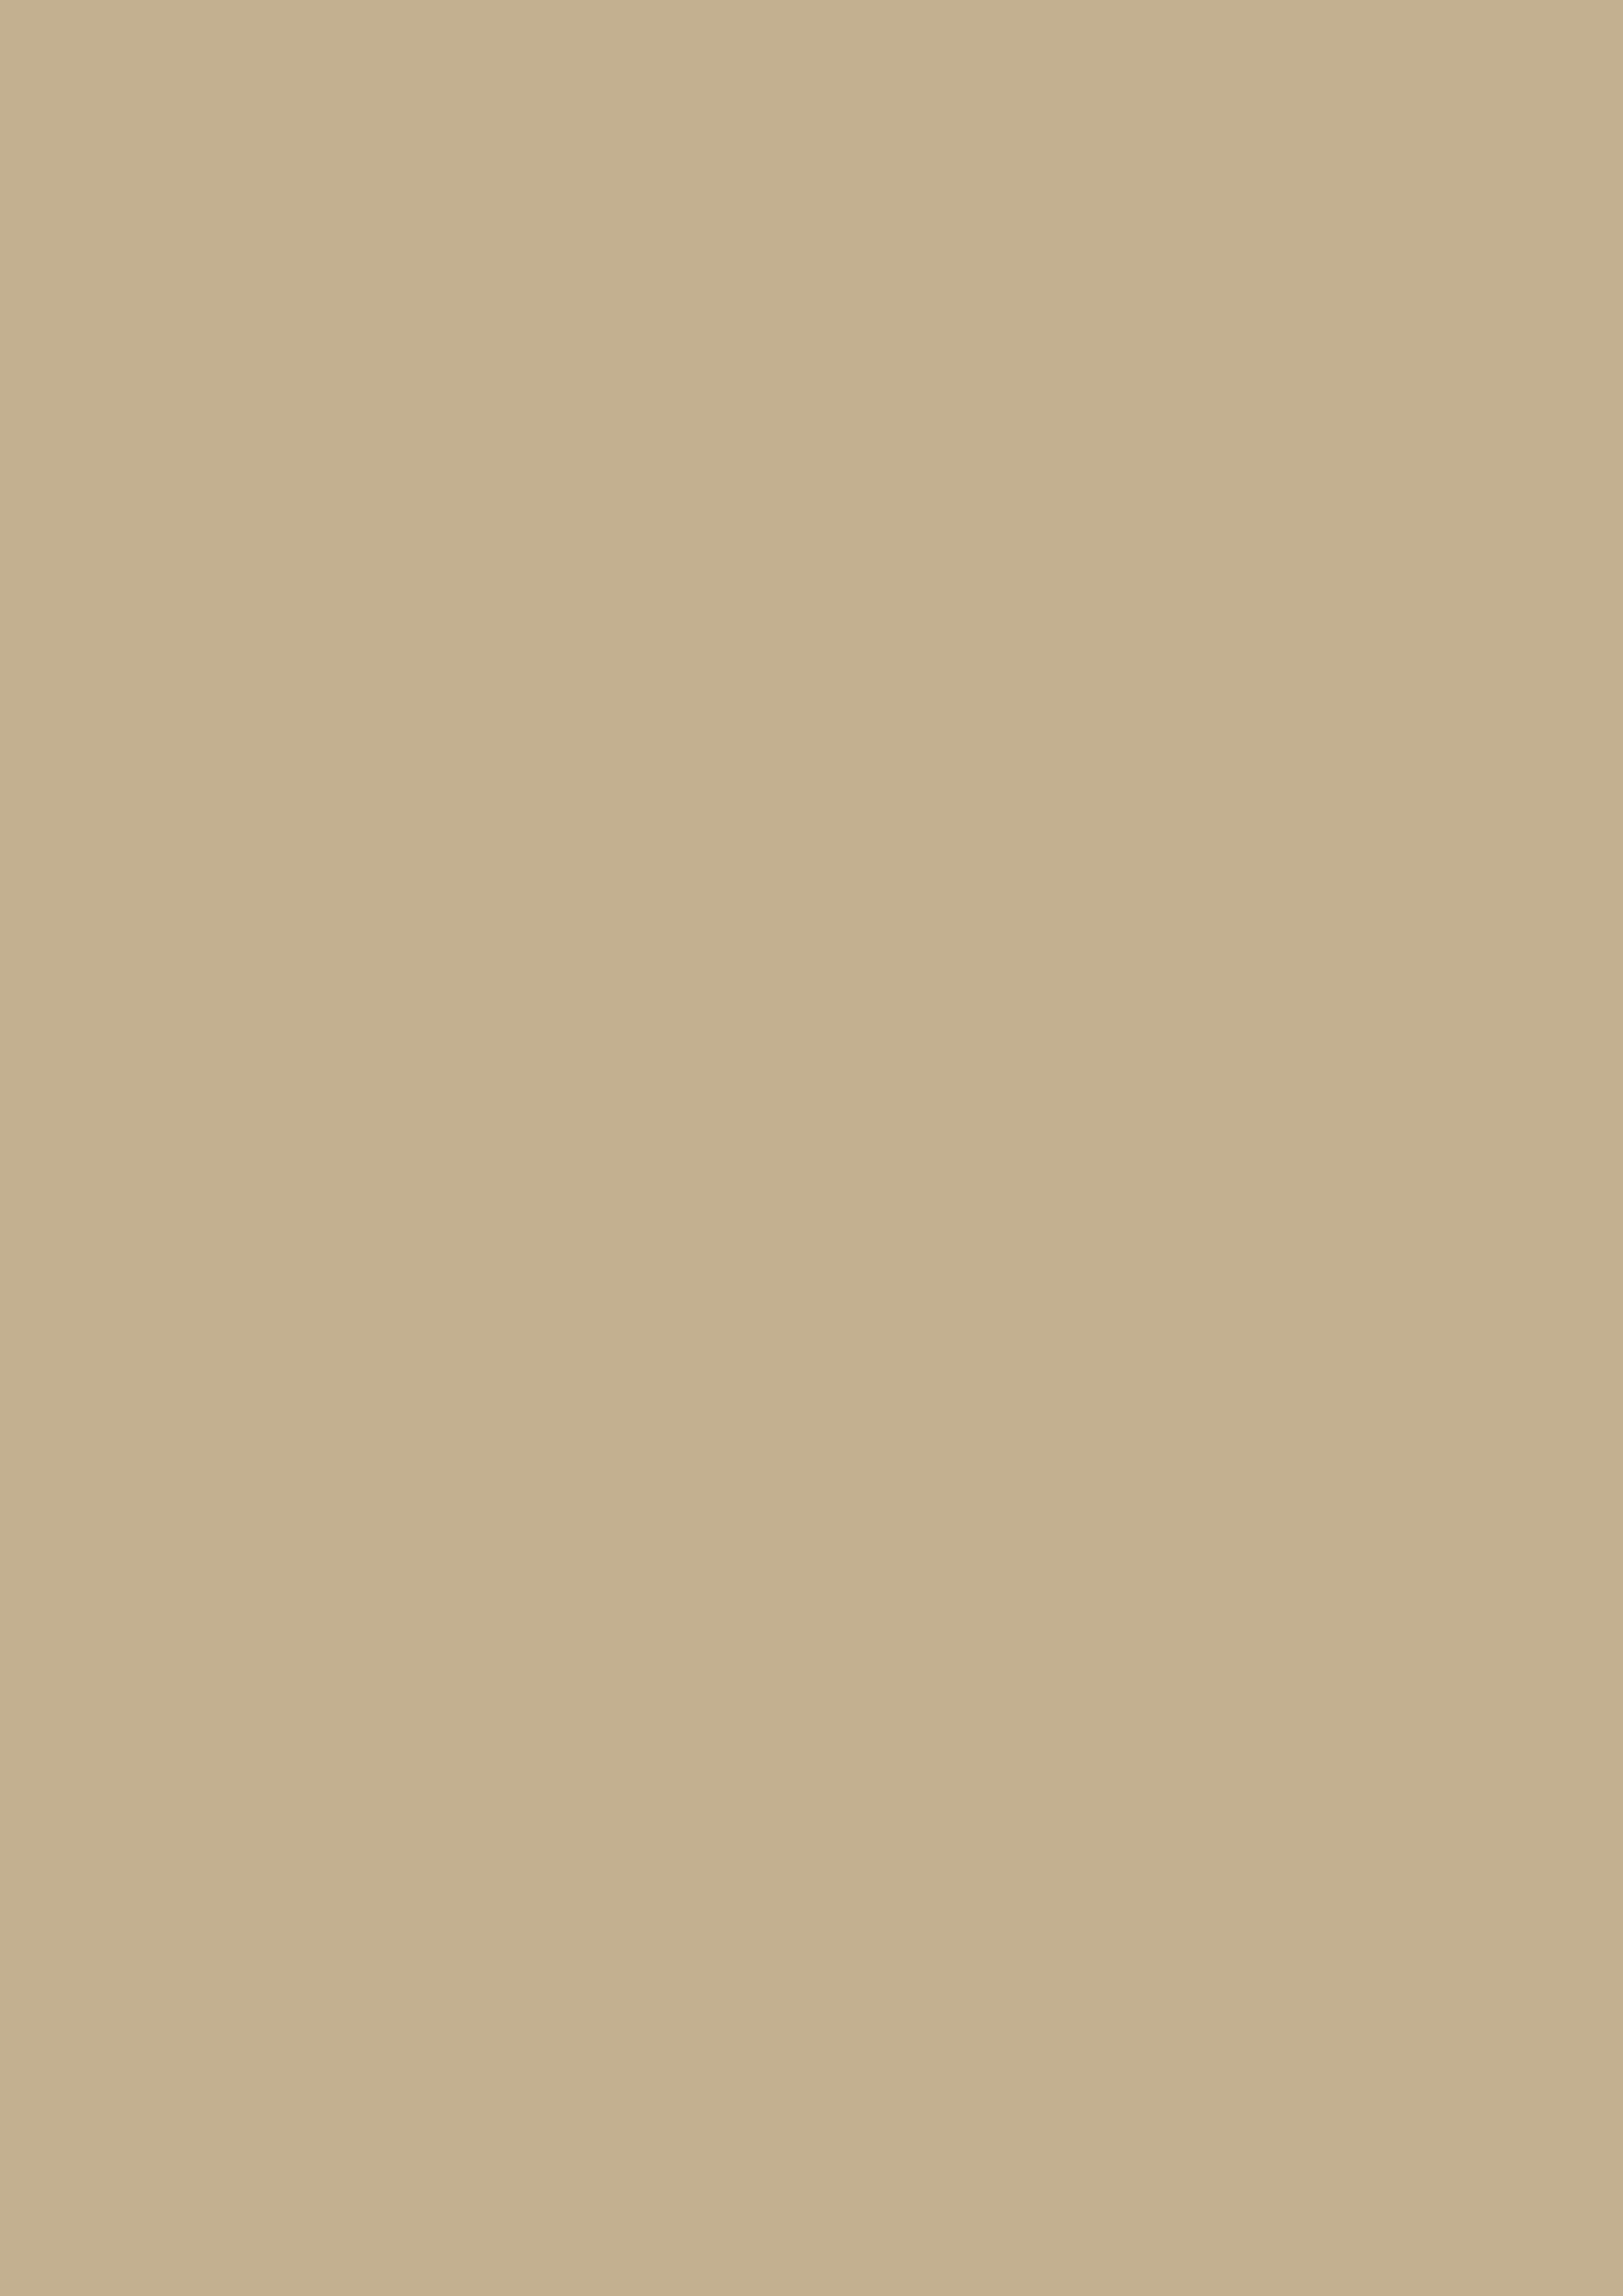 2480x3508 Khaki Web Solid Color Background